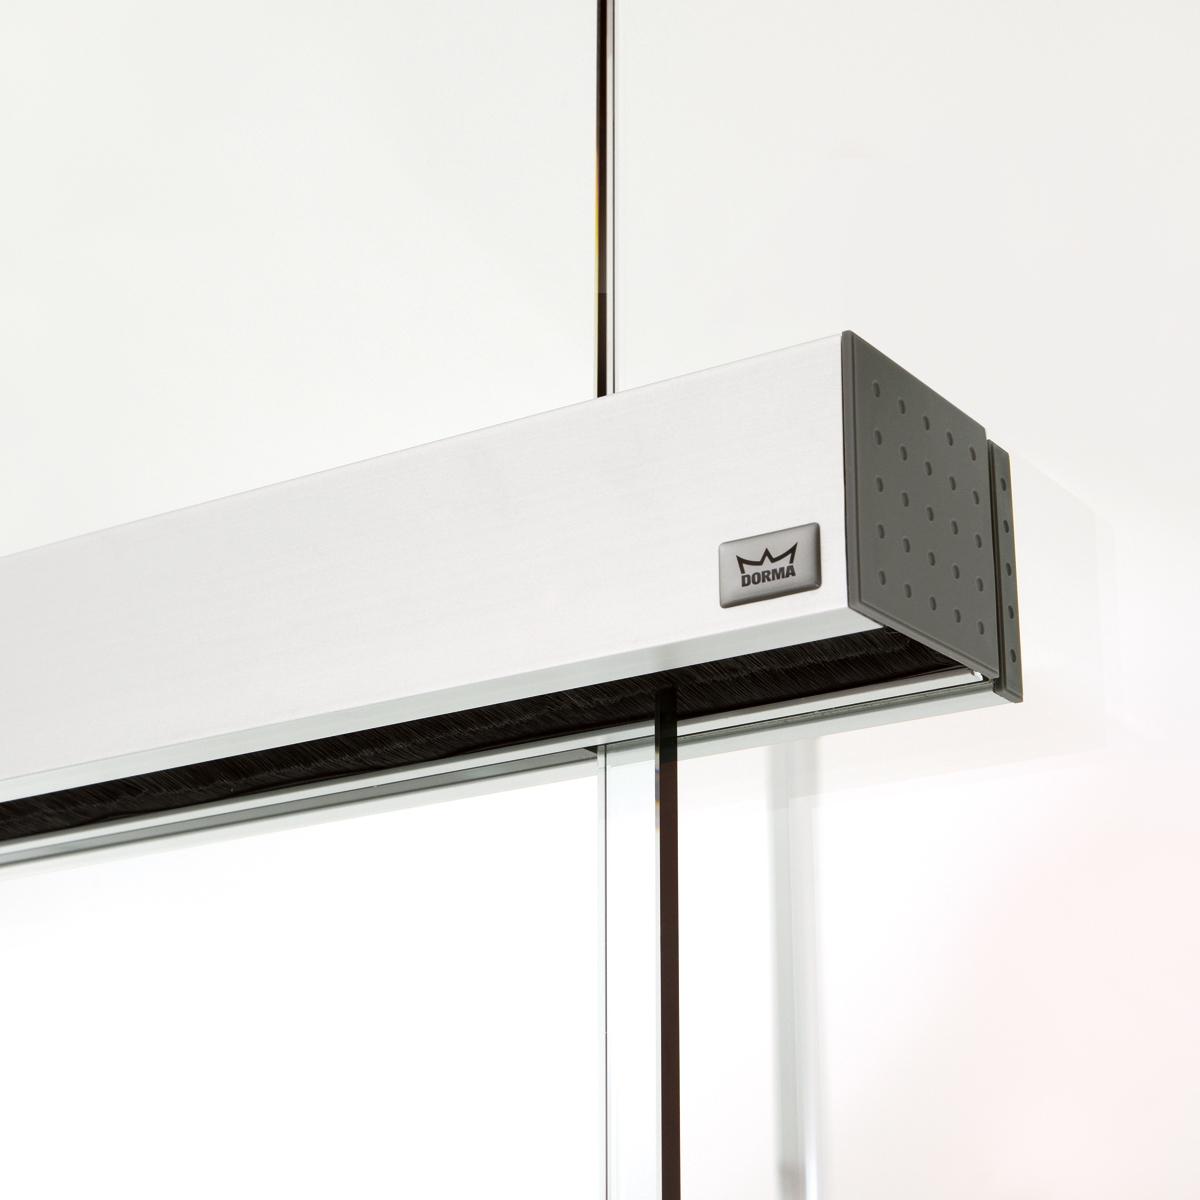 Dorma Glass Sliding Door Geardorma products opening closing manual sliding door systems